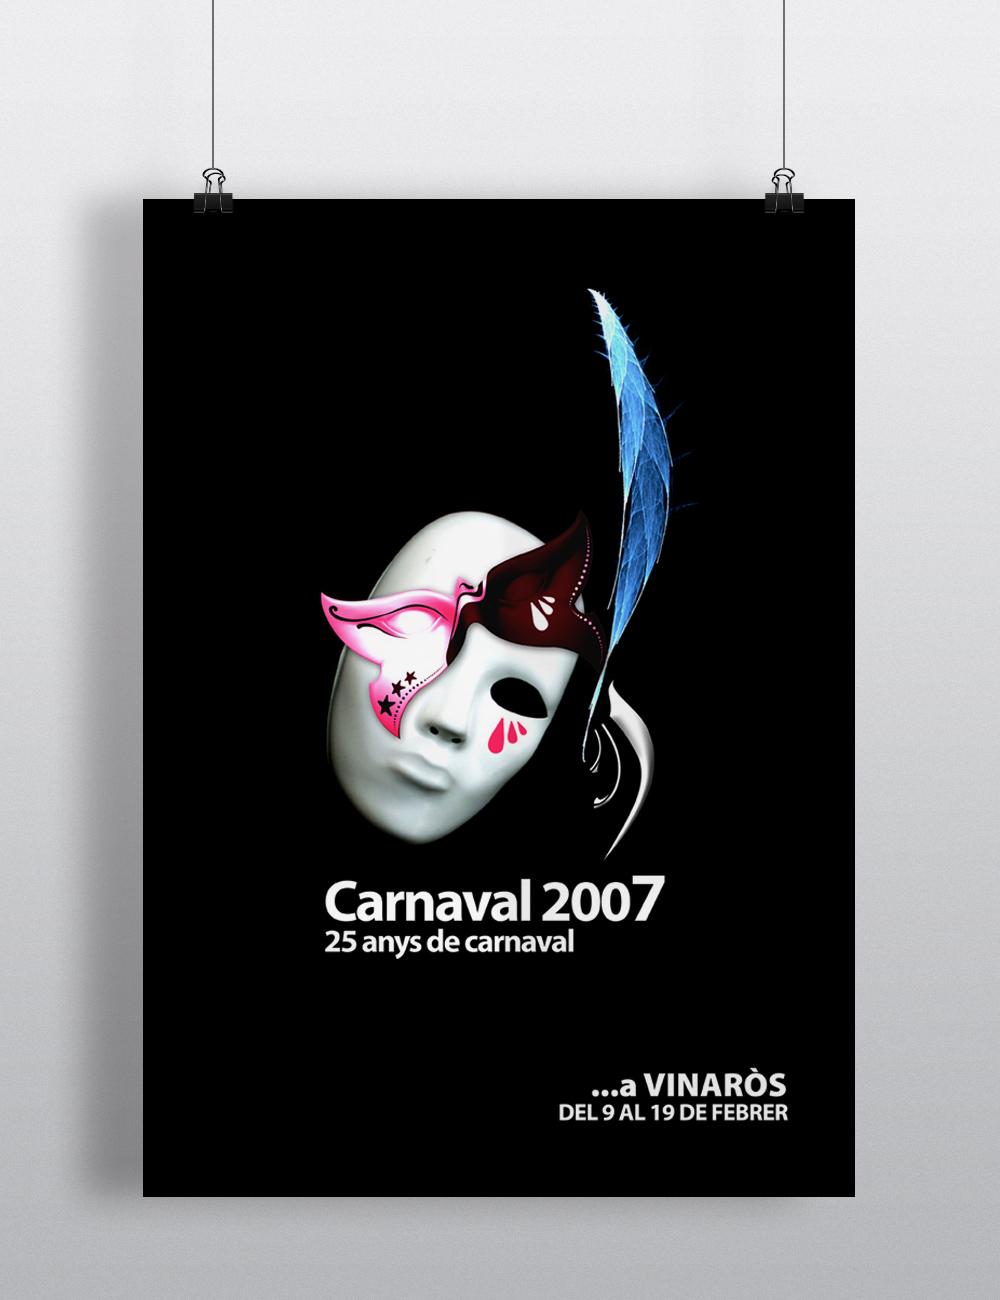 carnaval-2007-vinaros